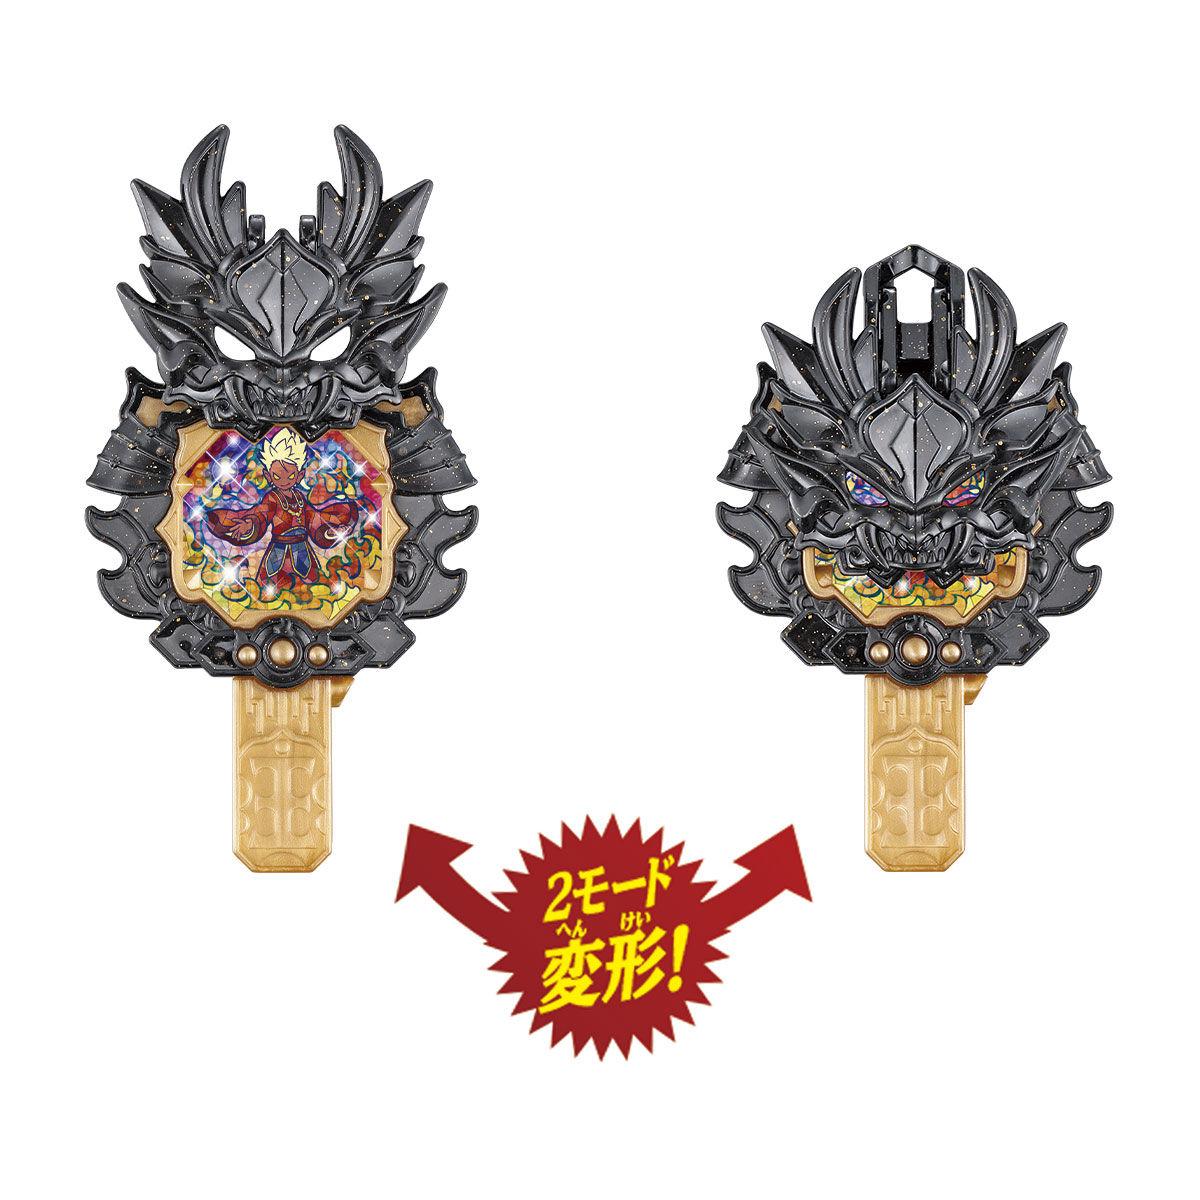 DX妖怪アークシリーズ04 妖魔一武道会 エンマ大王